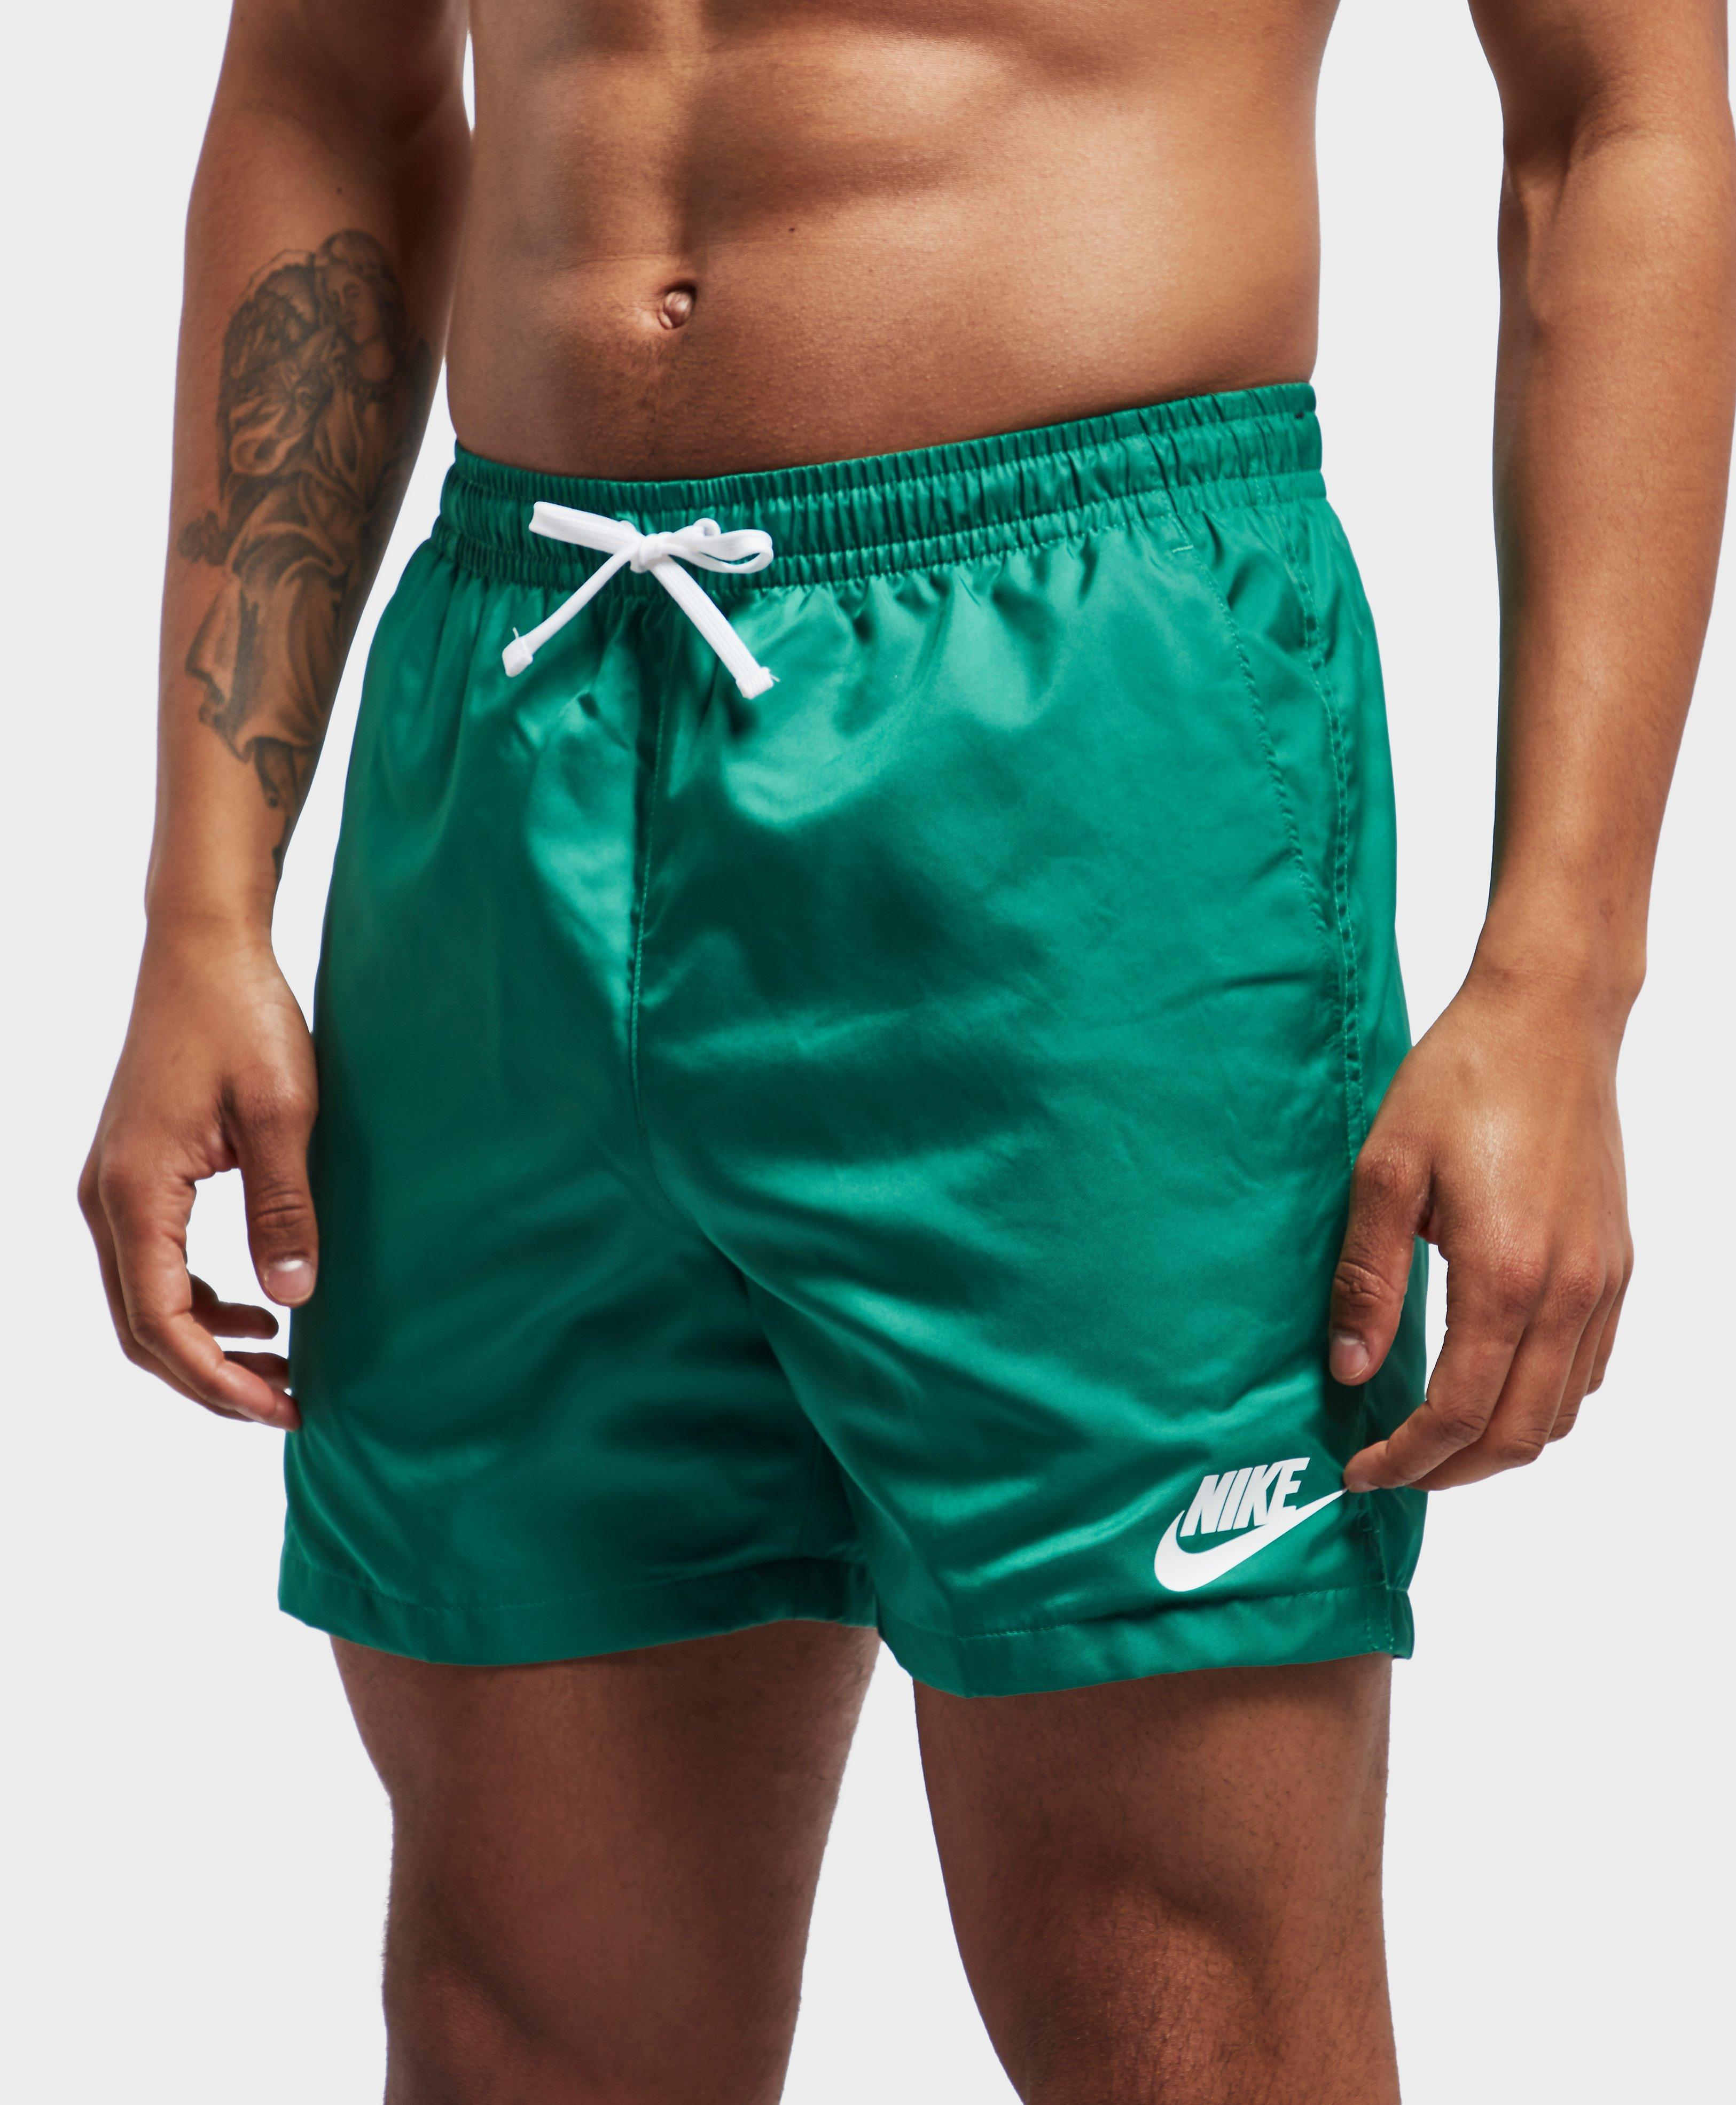 efdef37b97 Nike Flow Swim Shorts in Green for Men - Lyst